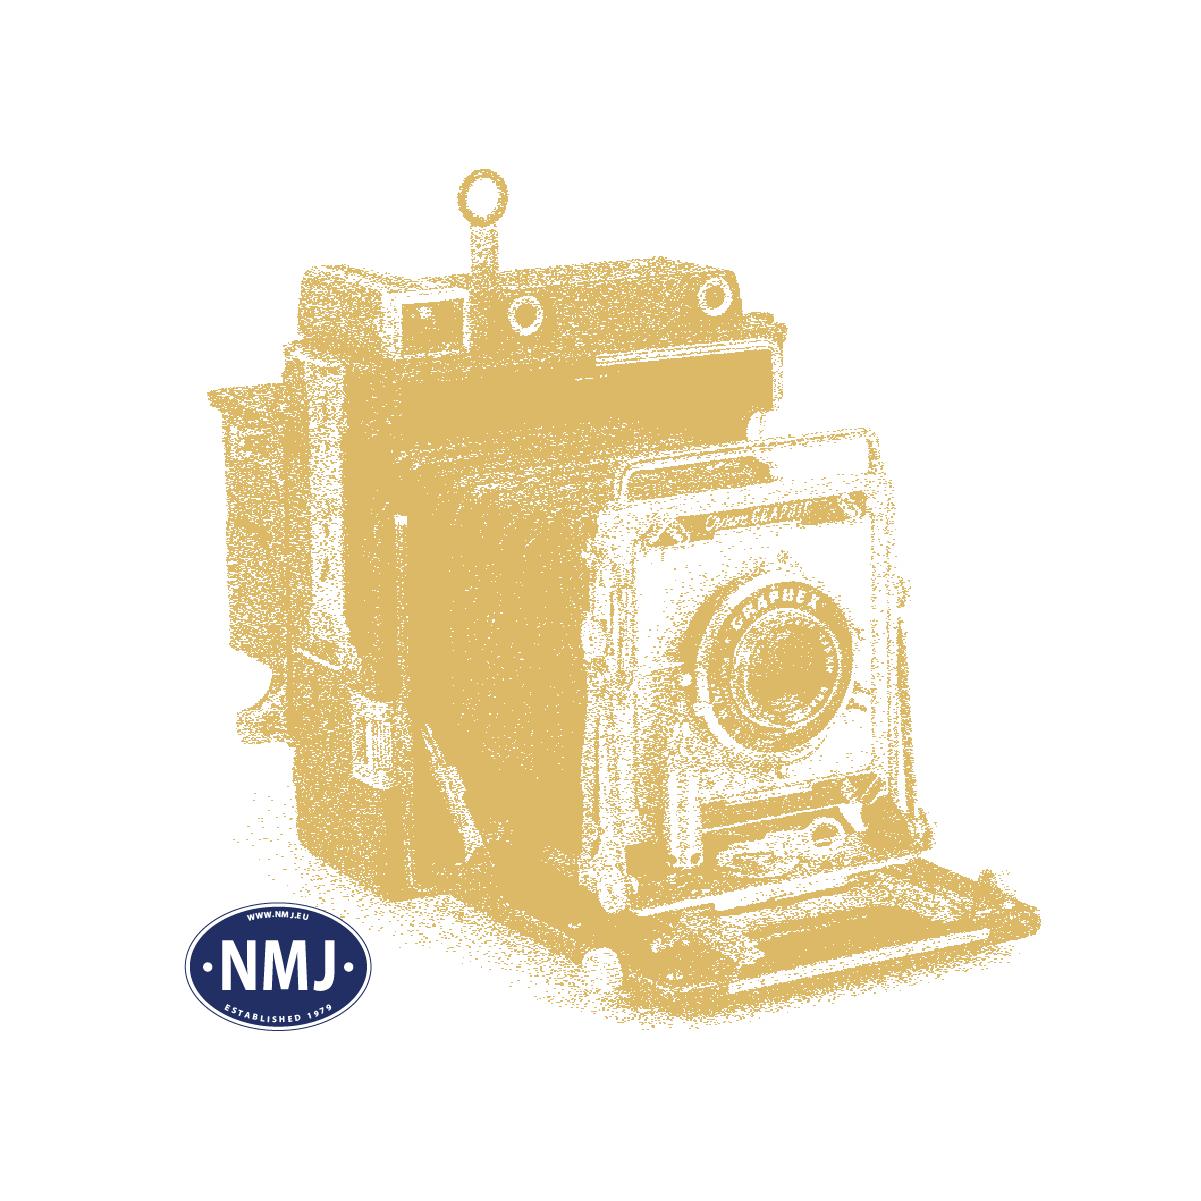 NMJT202.002 - NMJ Topline SJ AB2 4855, 1/2 Cl. Passenger coach, old SJ logo